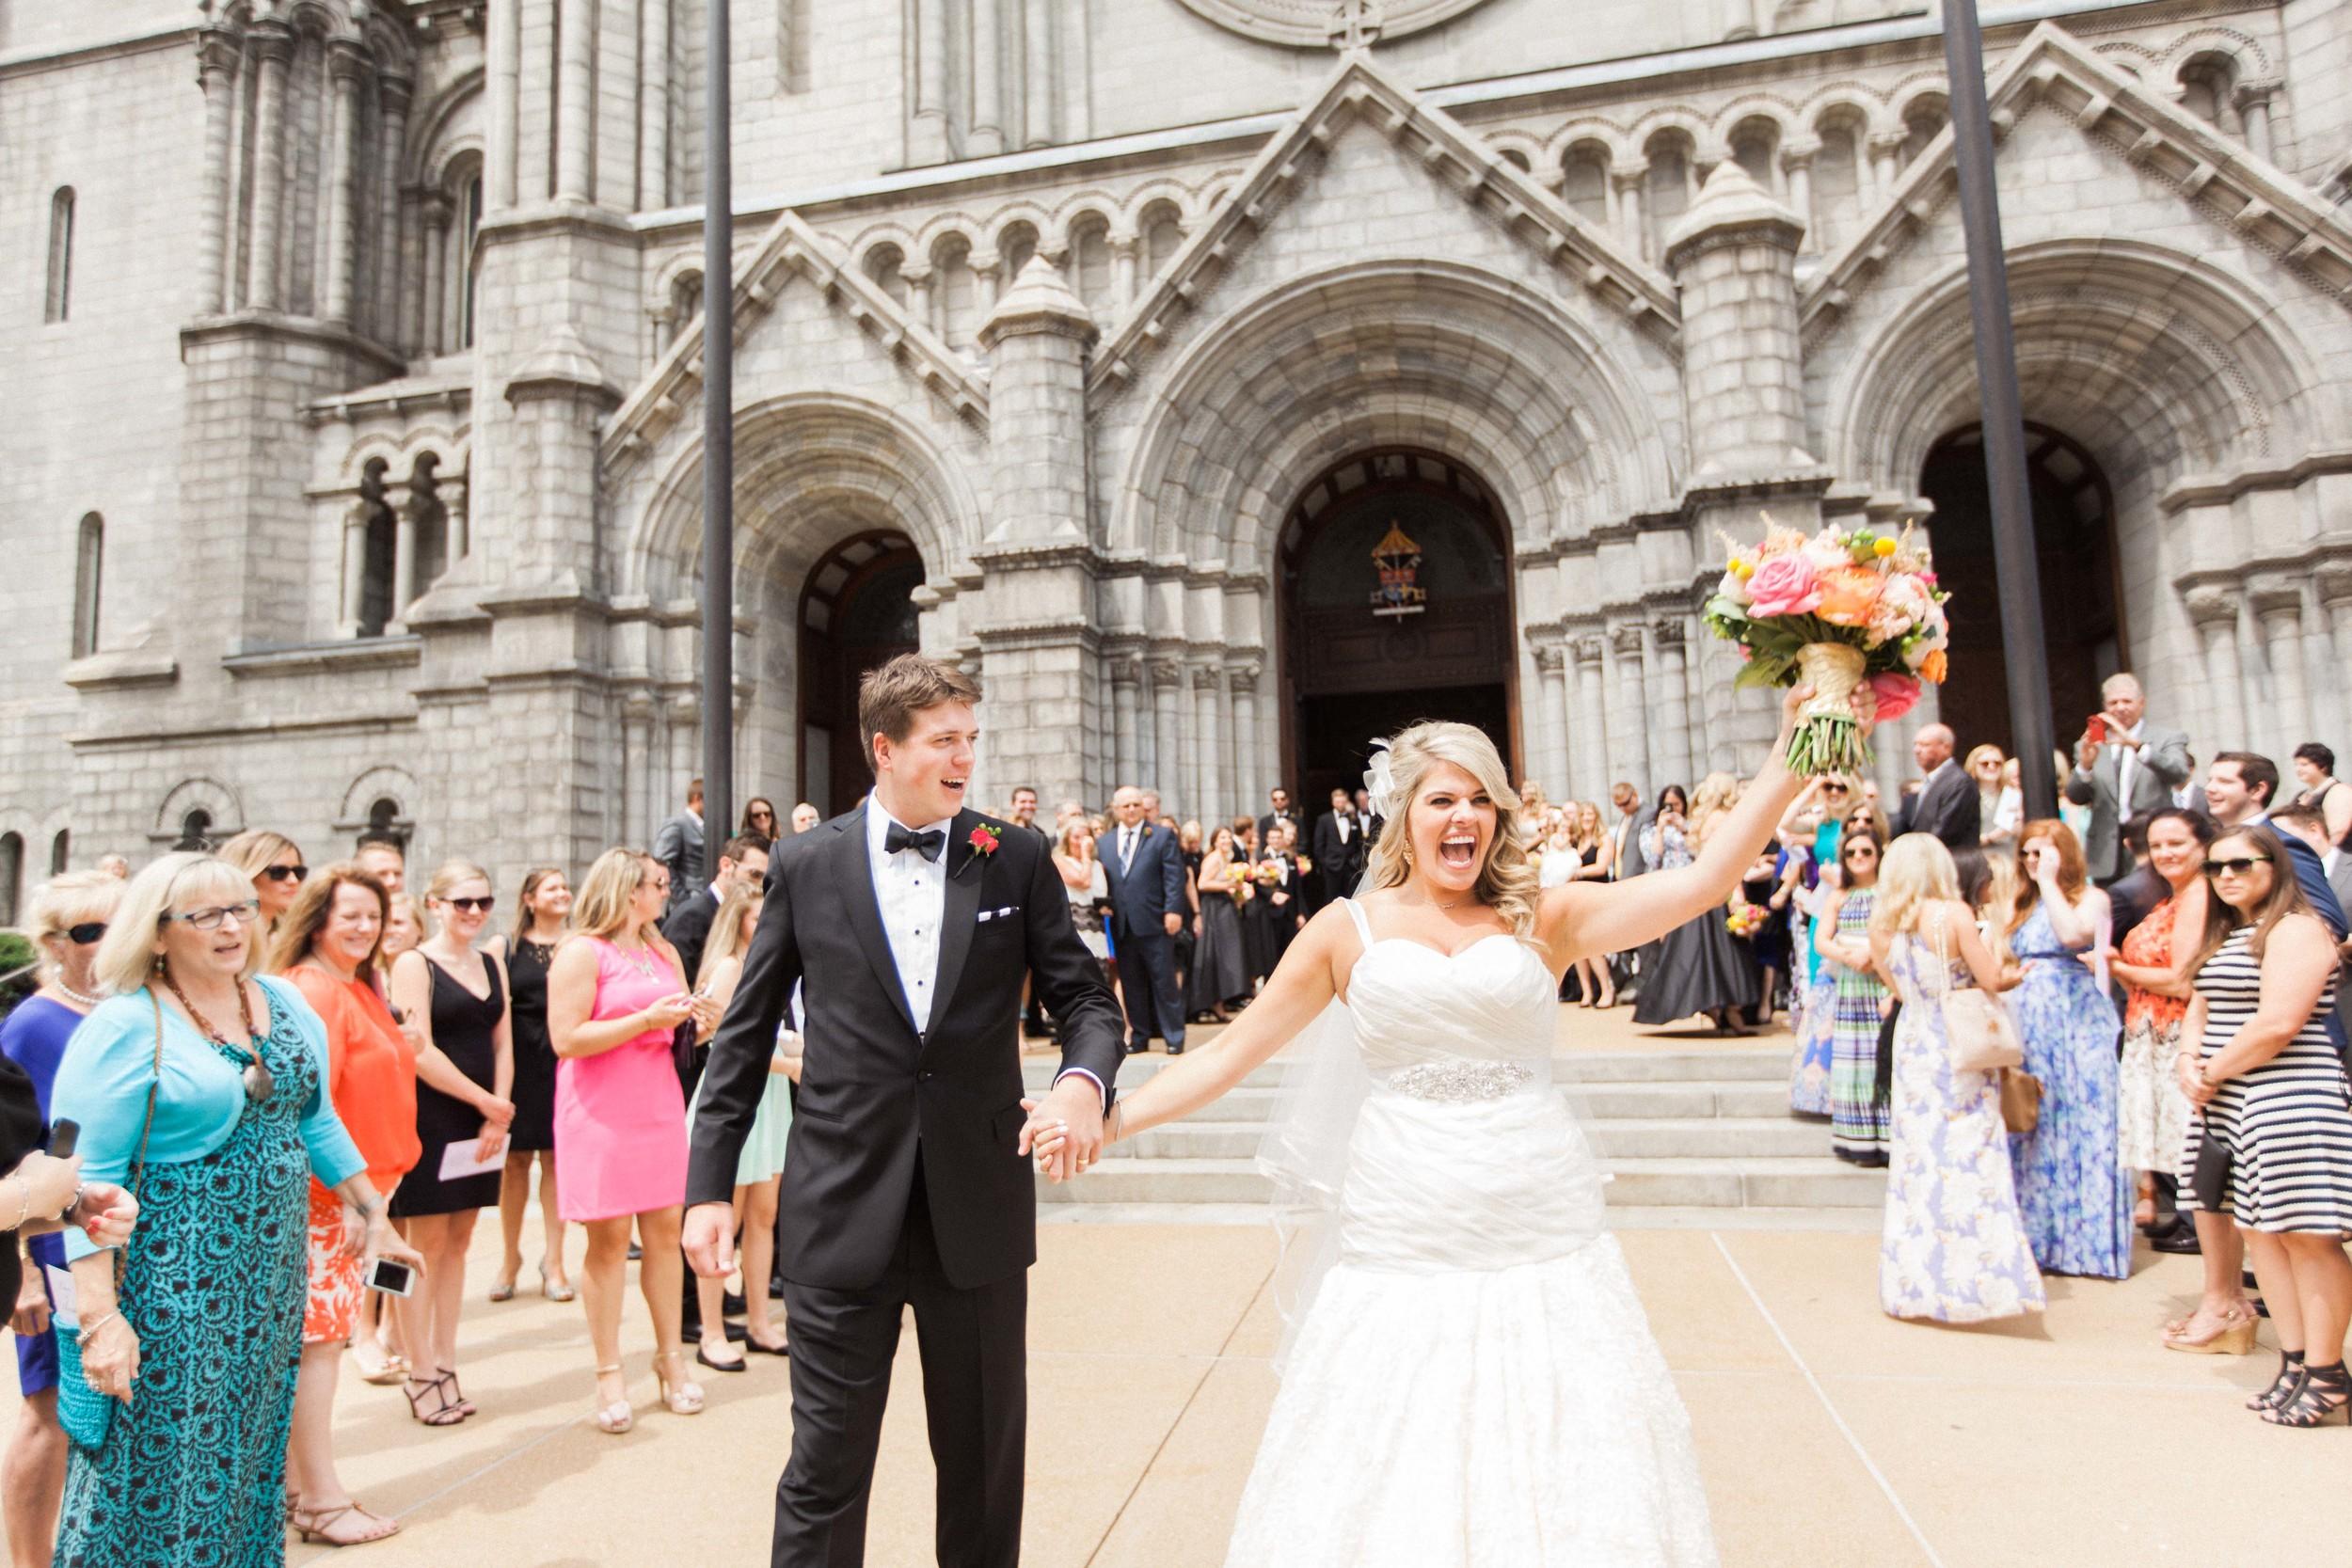 Chase Park Plaza St Louis Wedding Photo-1040.jpg